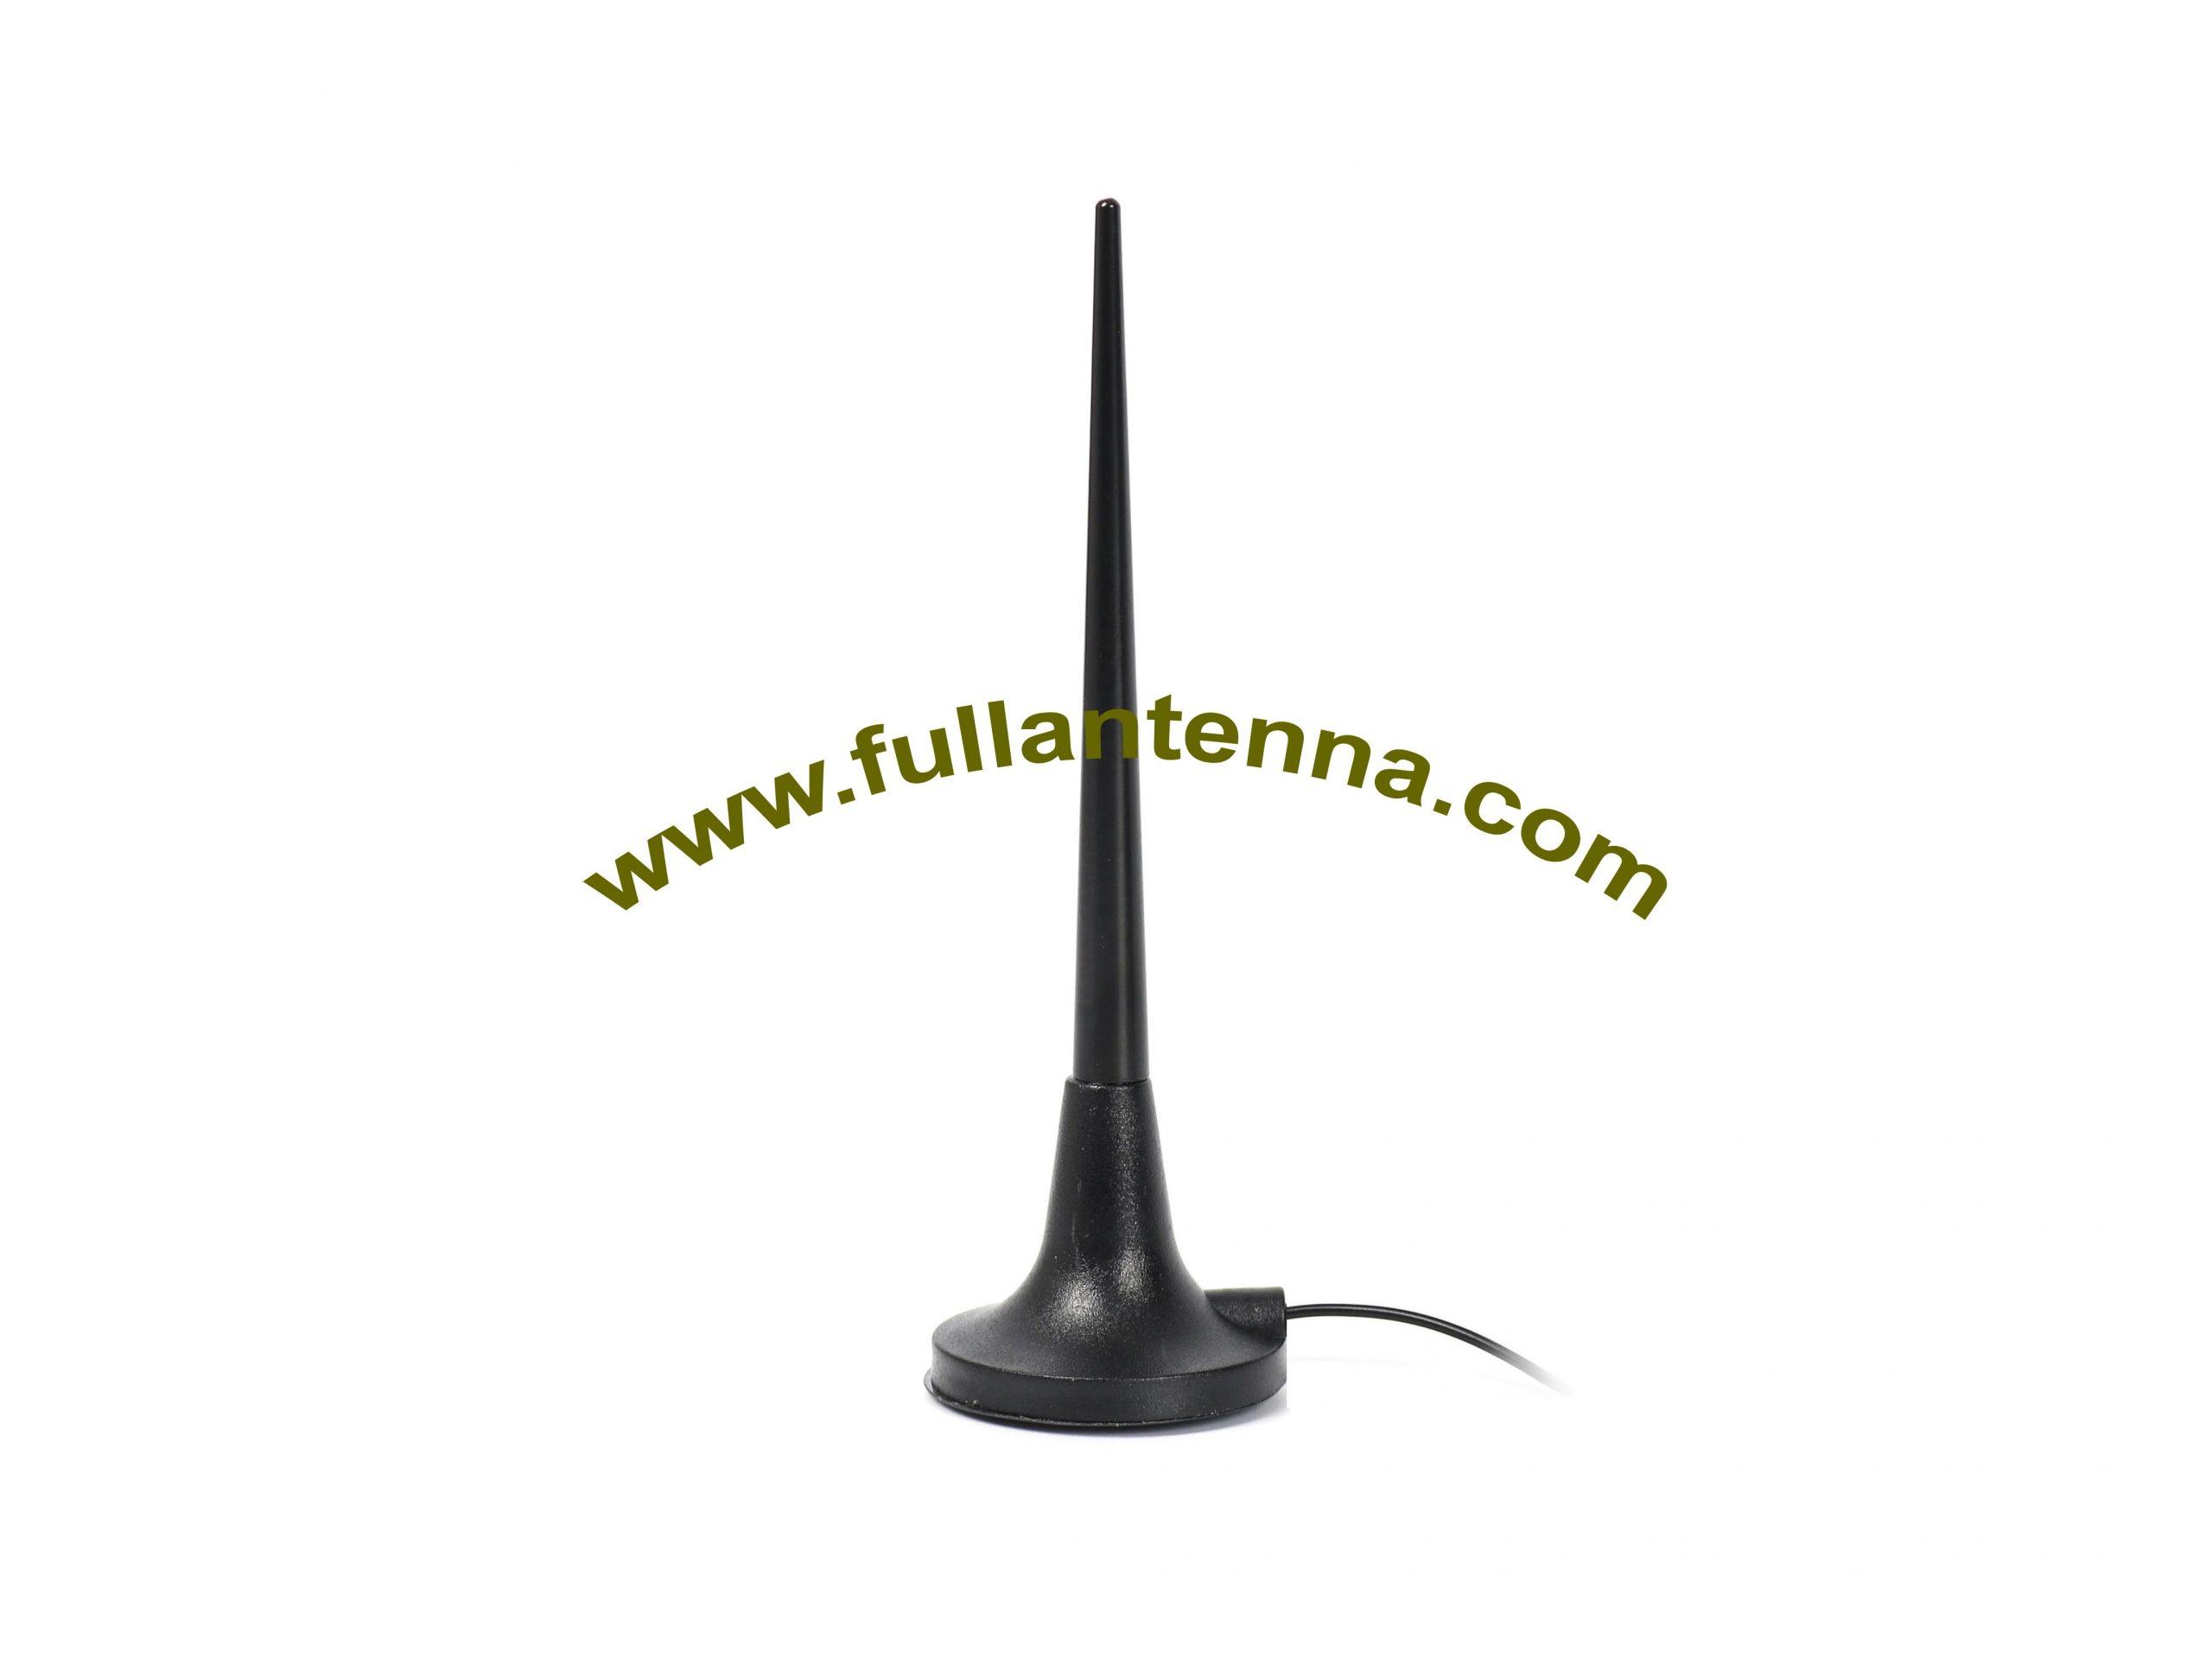 P/N:FAGSM.12,GSM External Antenna,Magnetic mount metal whip